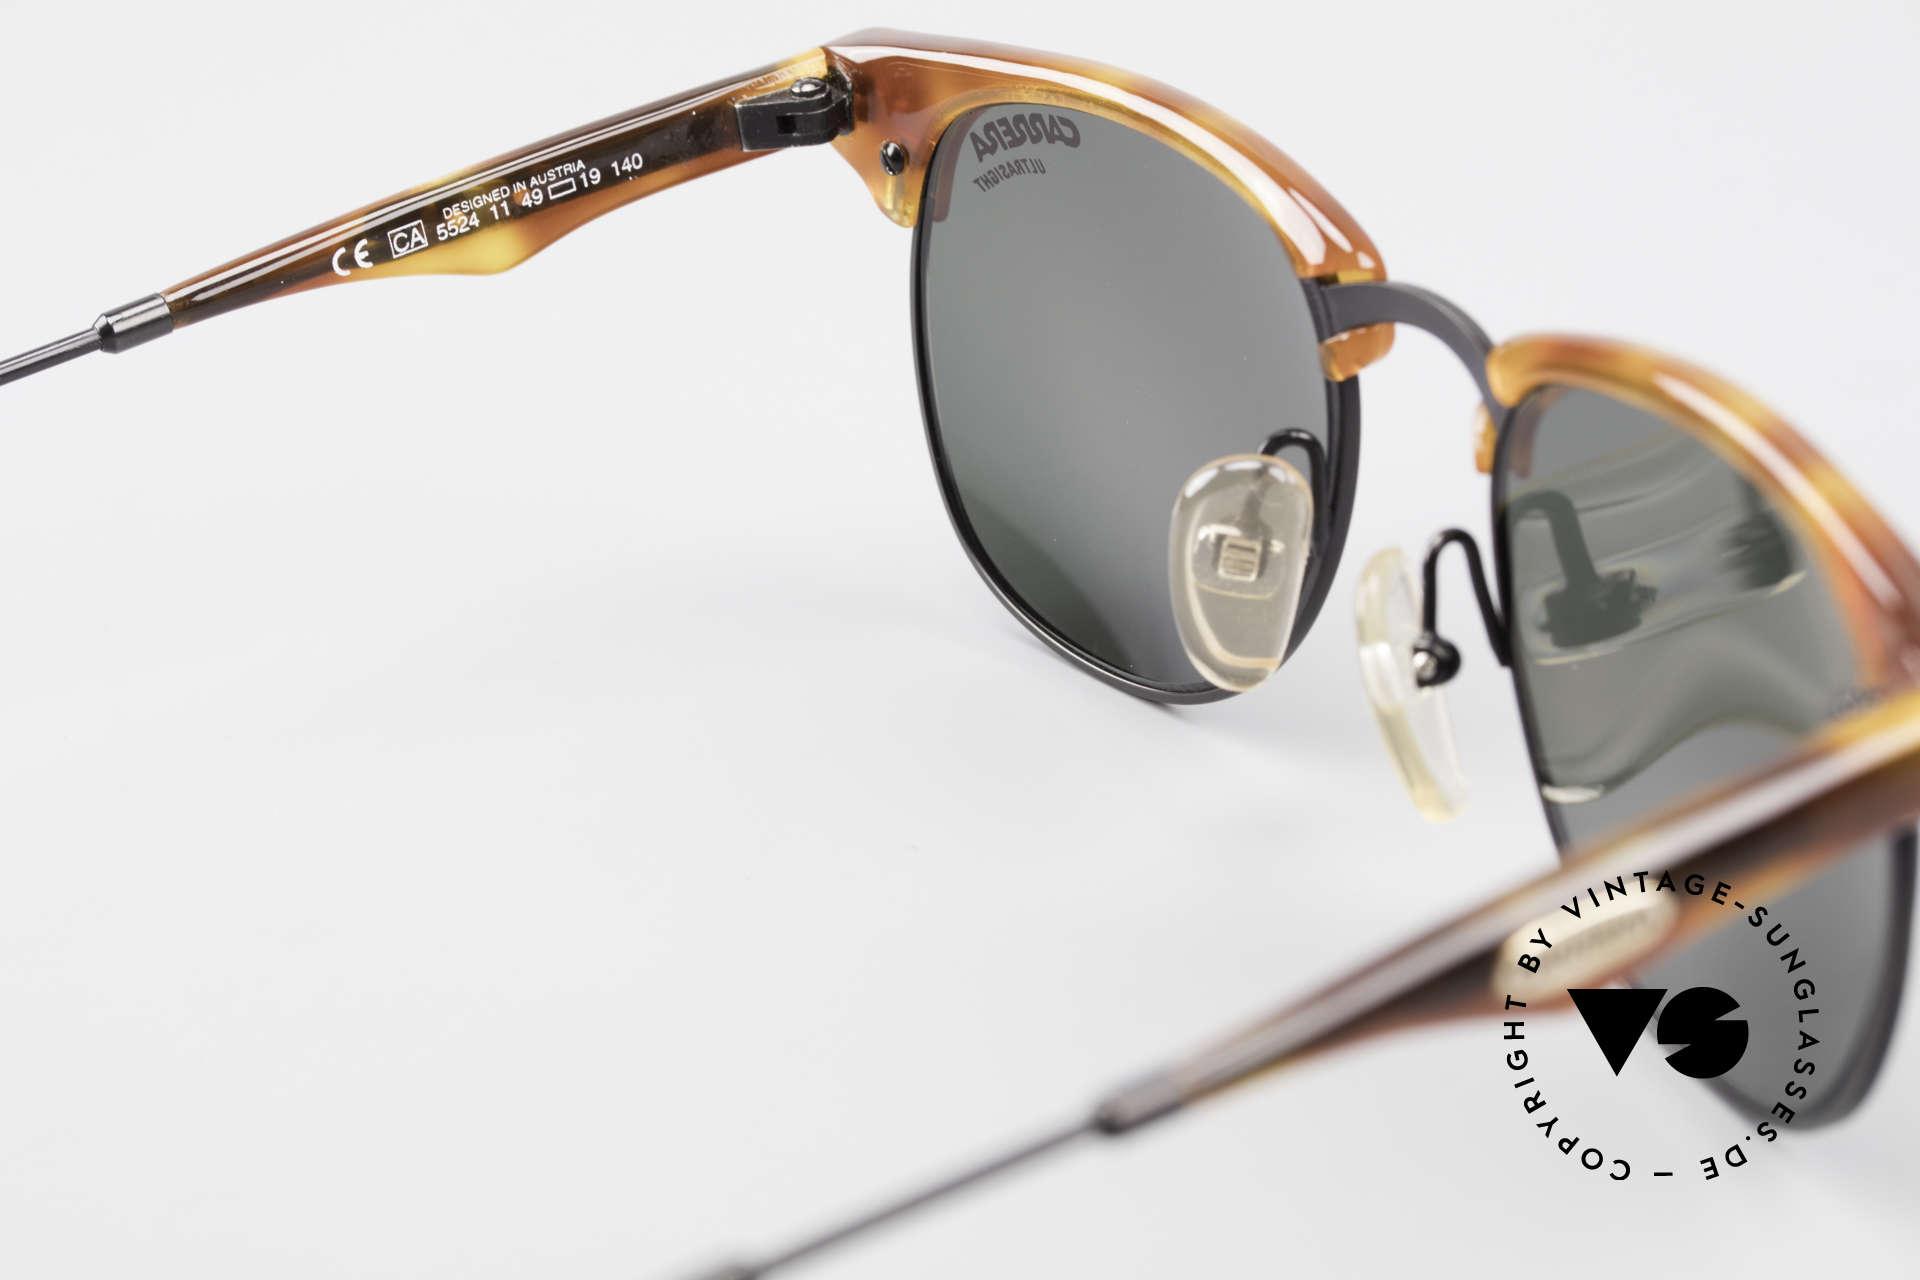 Carrera 5624 Clubmaster Shape Sunglasses, Size: small, Made for Men